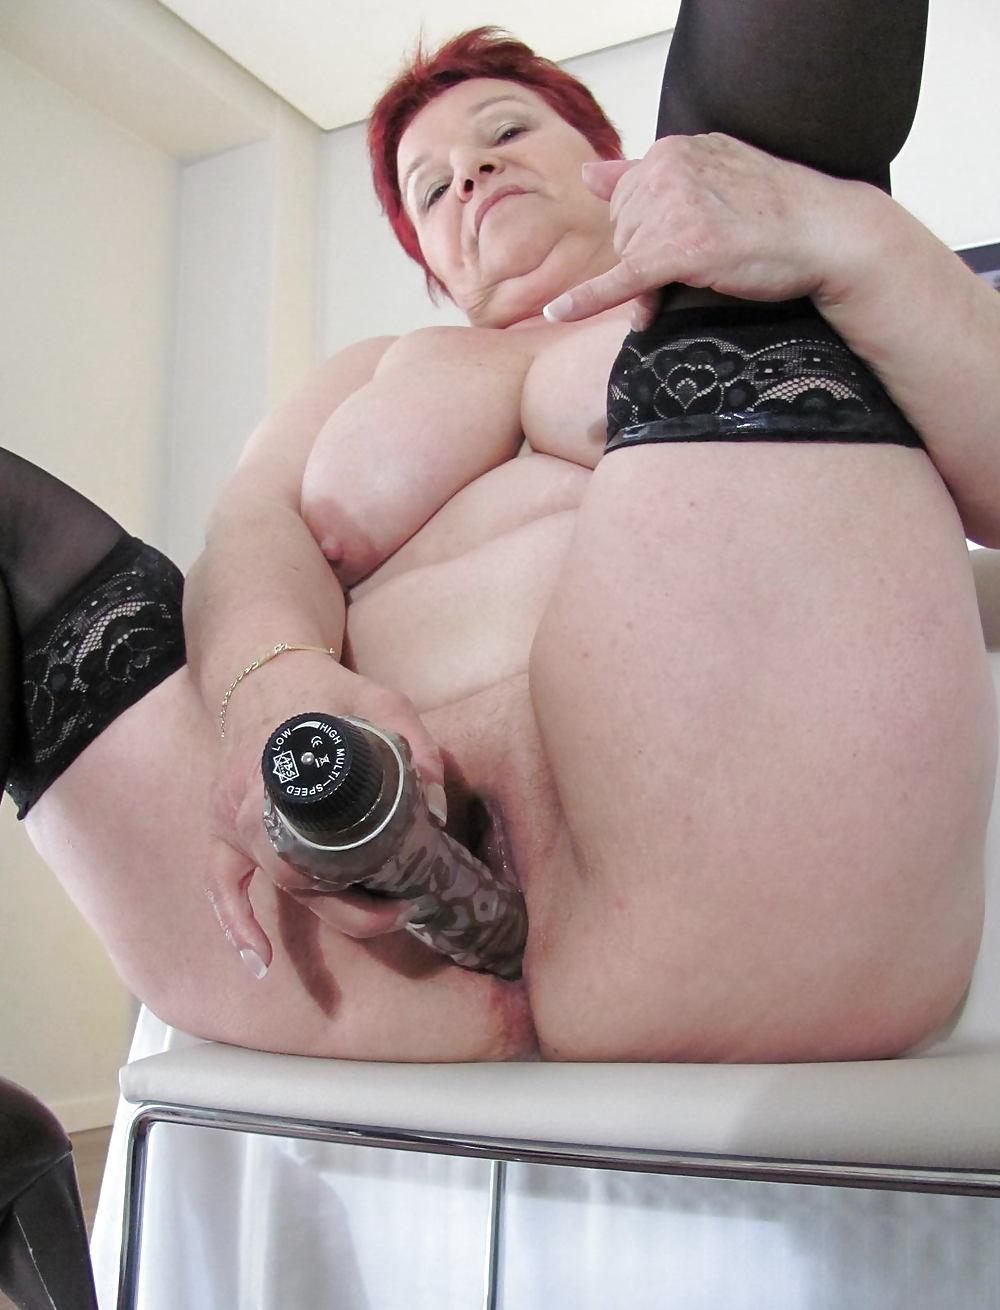 new zeland grannys porn photos